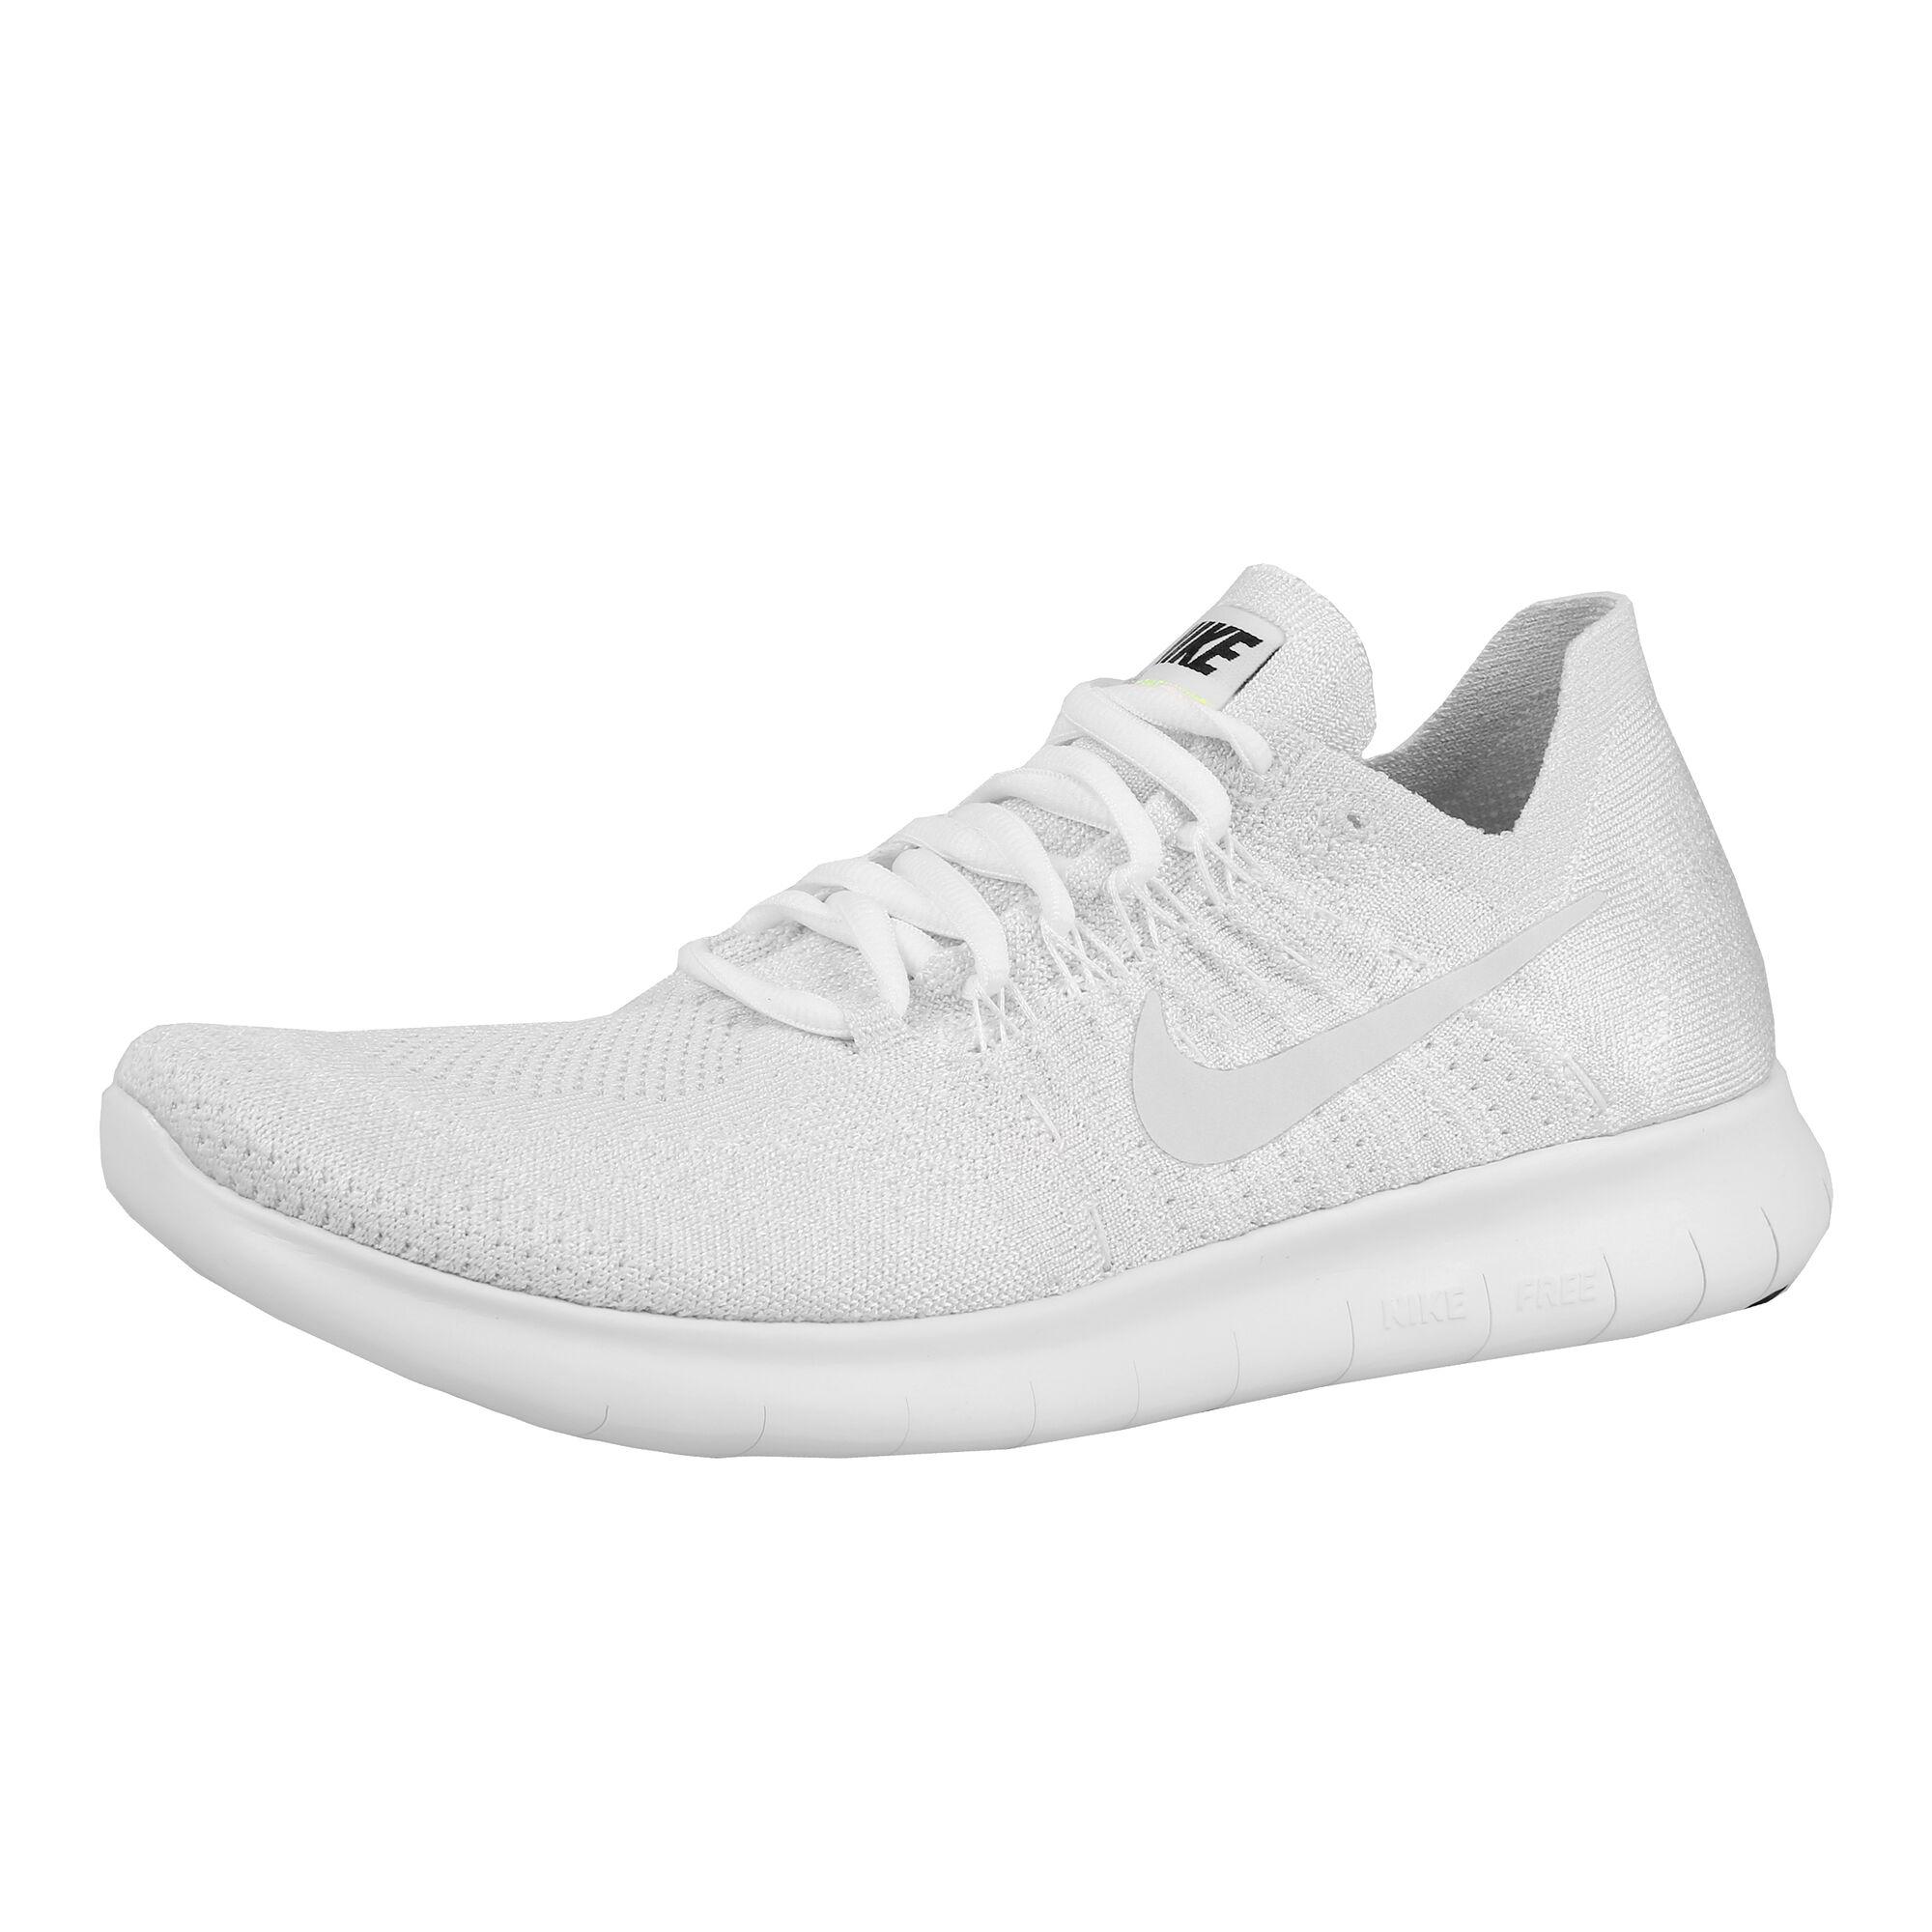 16639bad buy Nike Free Run Flyknit 2017 Natural Running Shoe Women - White ...